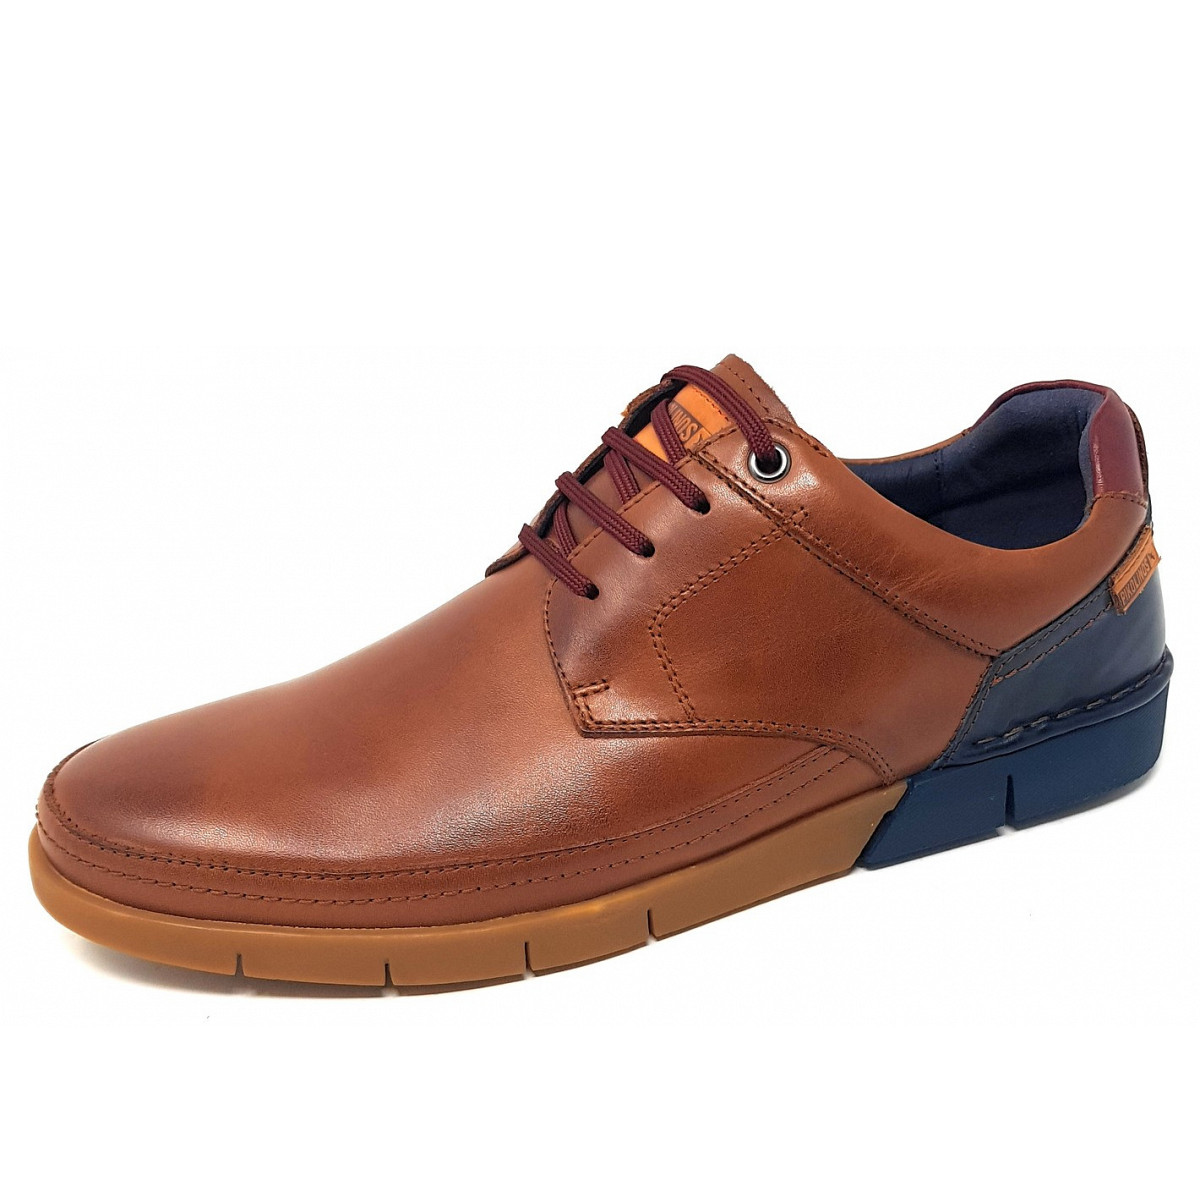 Pikolinos Schuhe SANTIAGO braun Herrenschuhe bequeme Slipper M8M-3172 cuero NEU